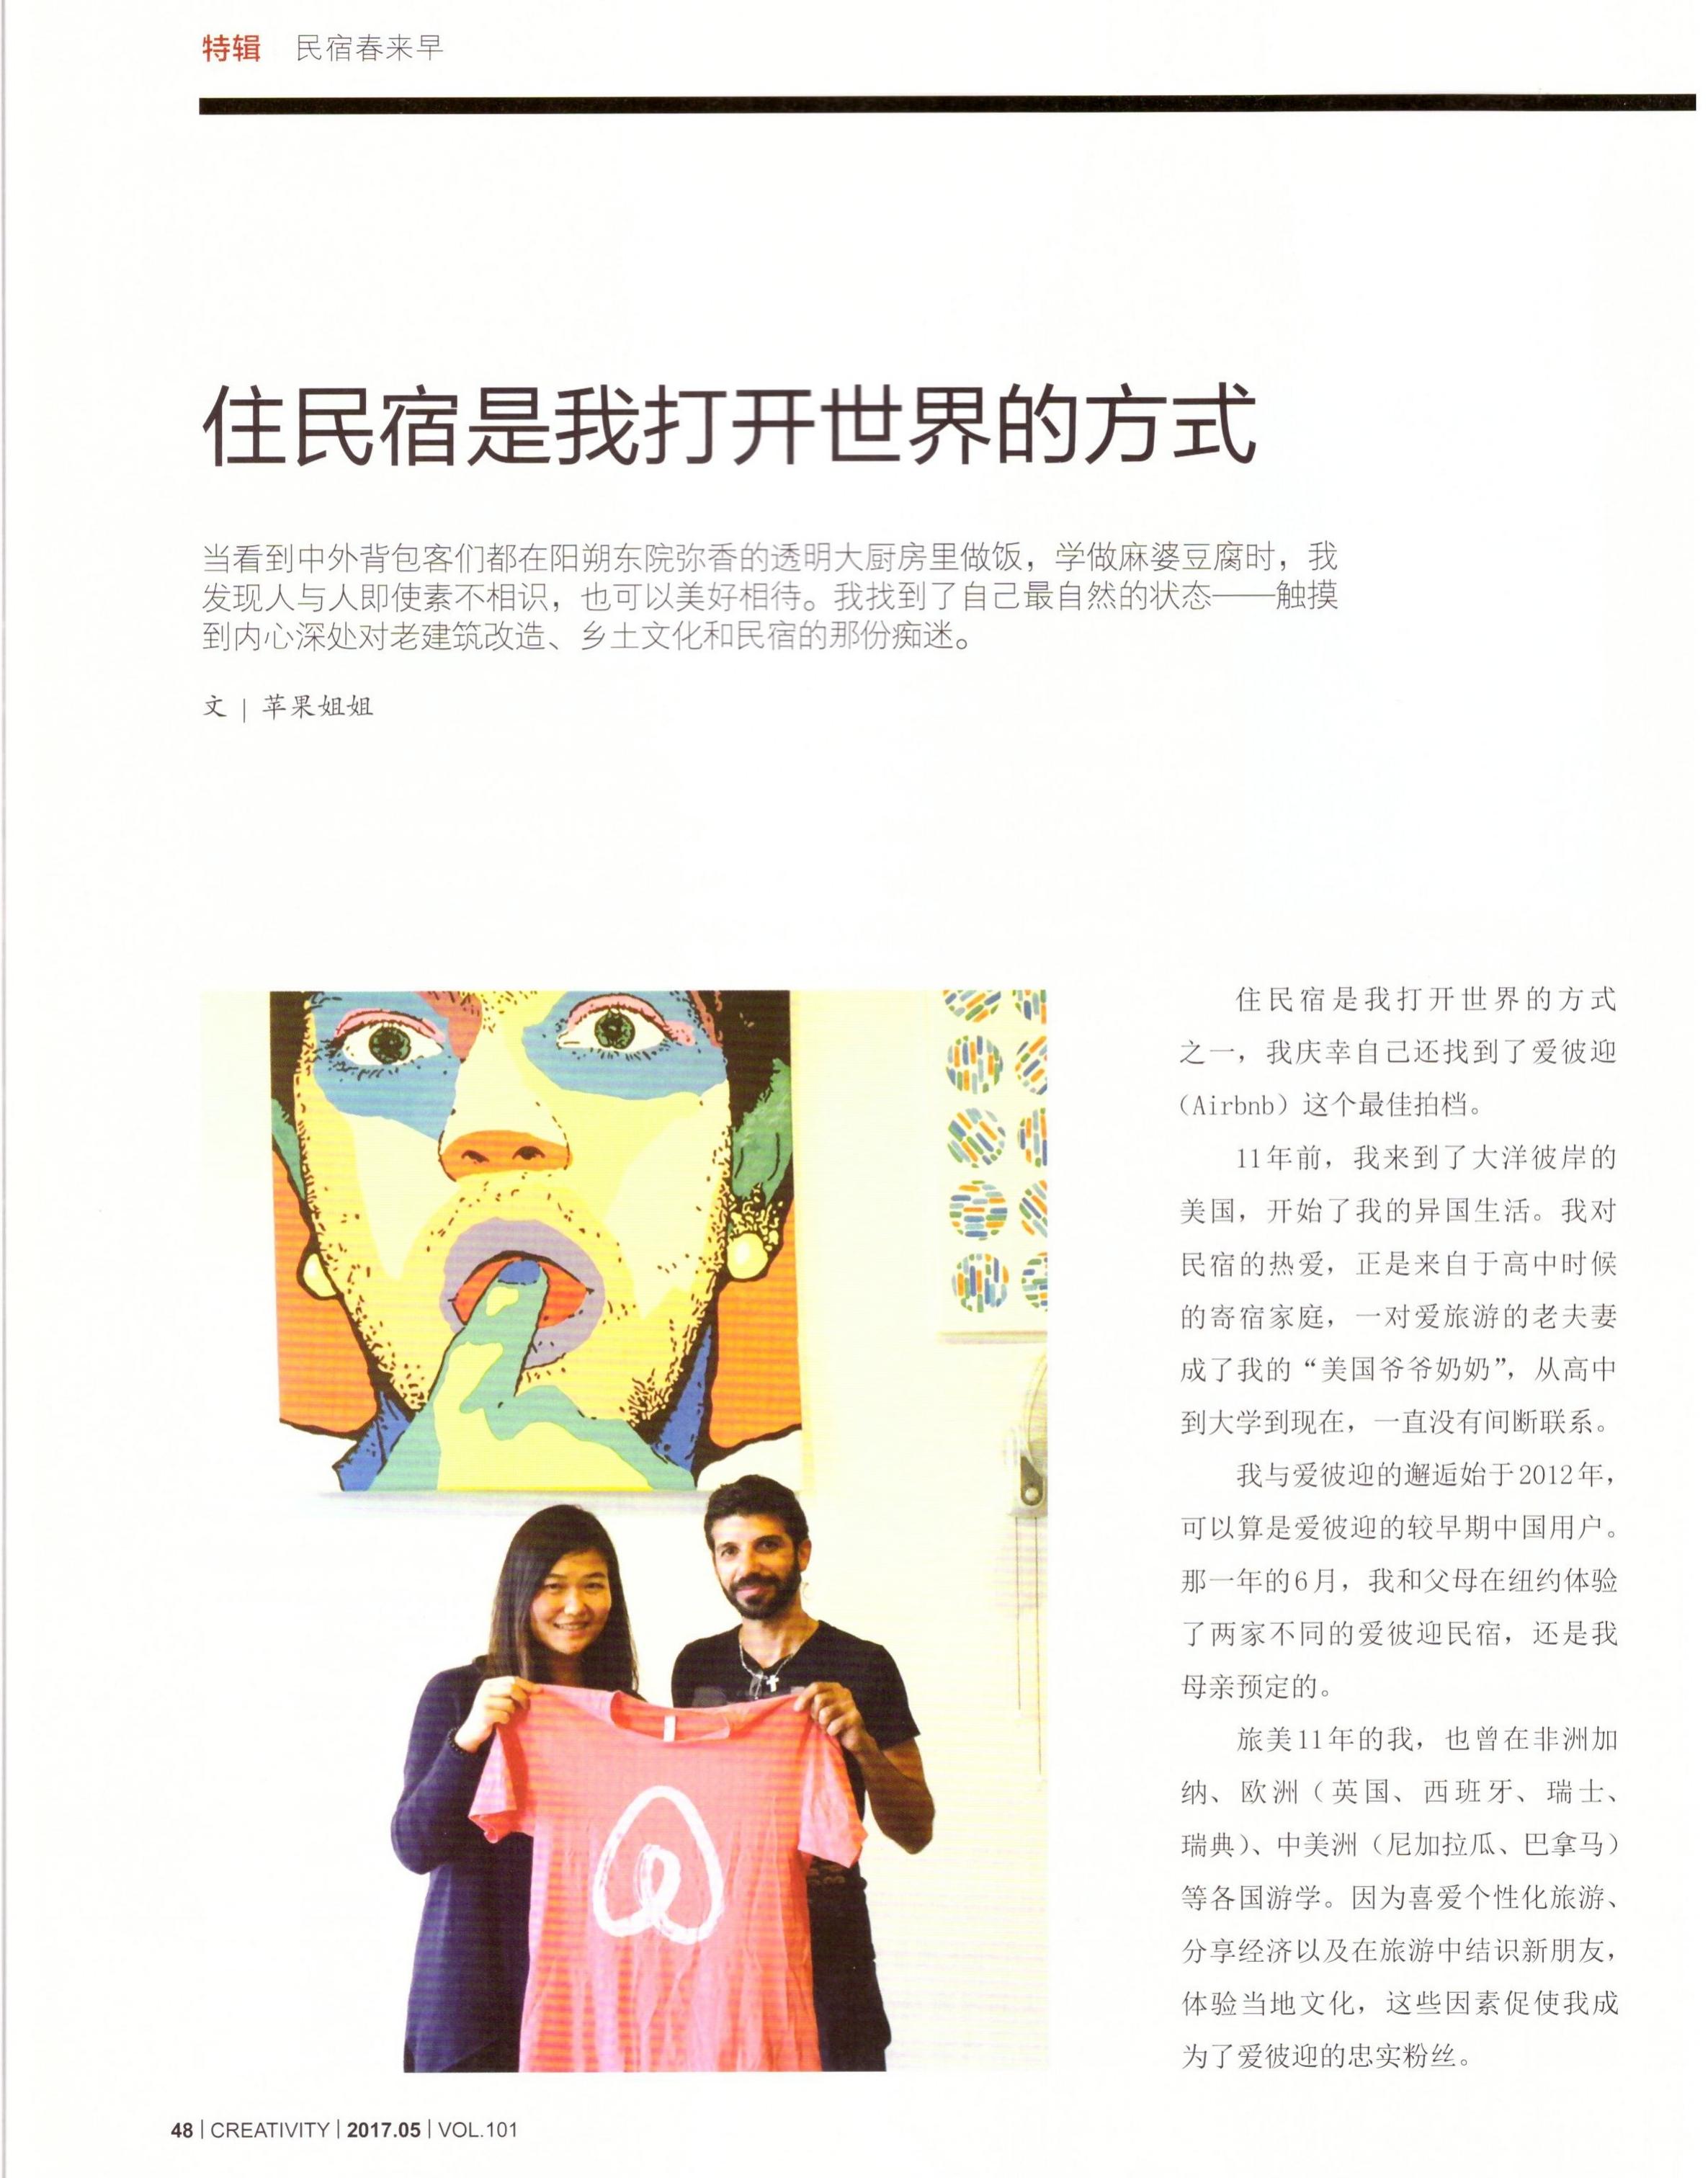 Creative World 创意世界, May 2017 Issue